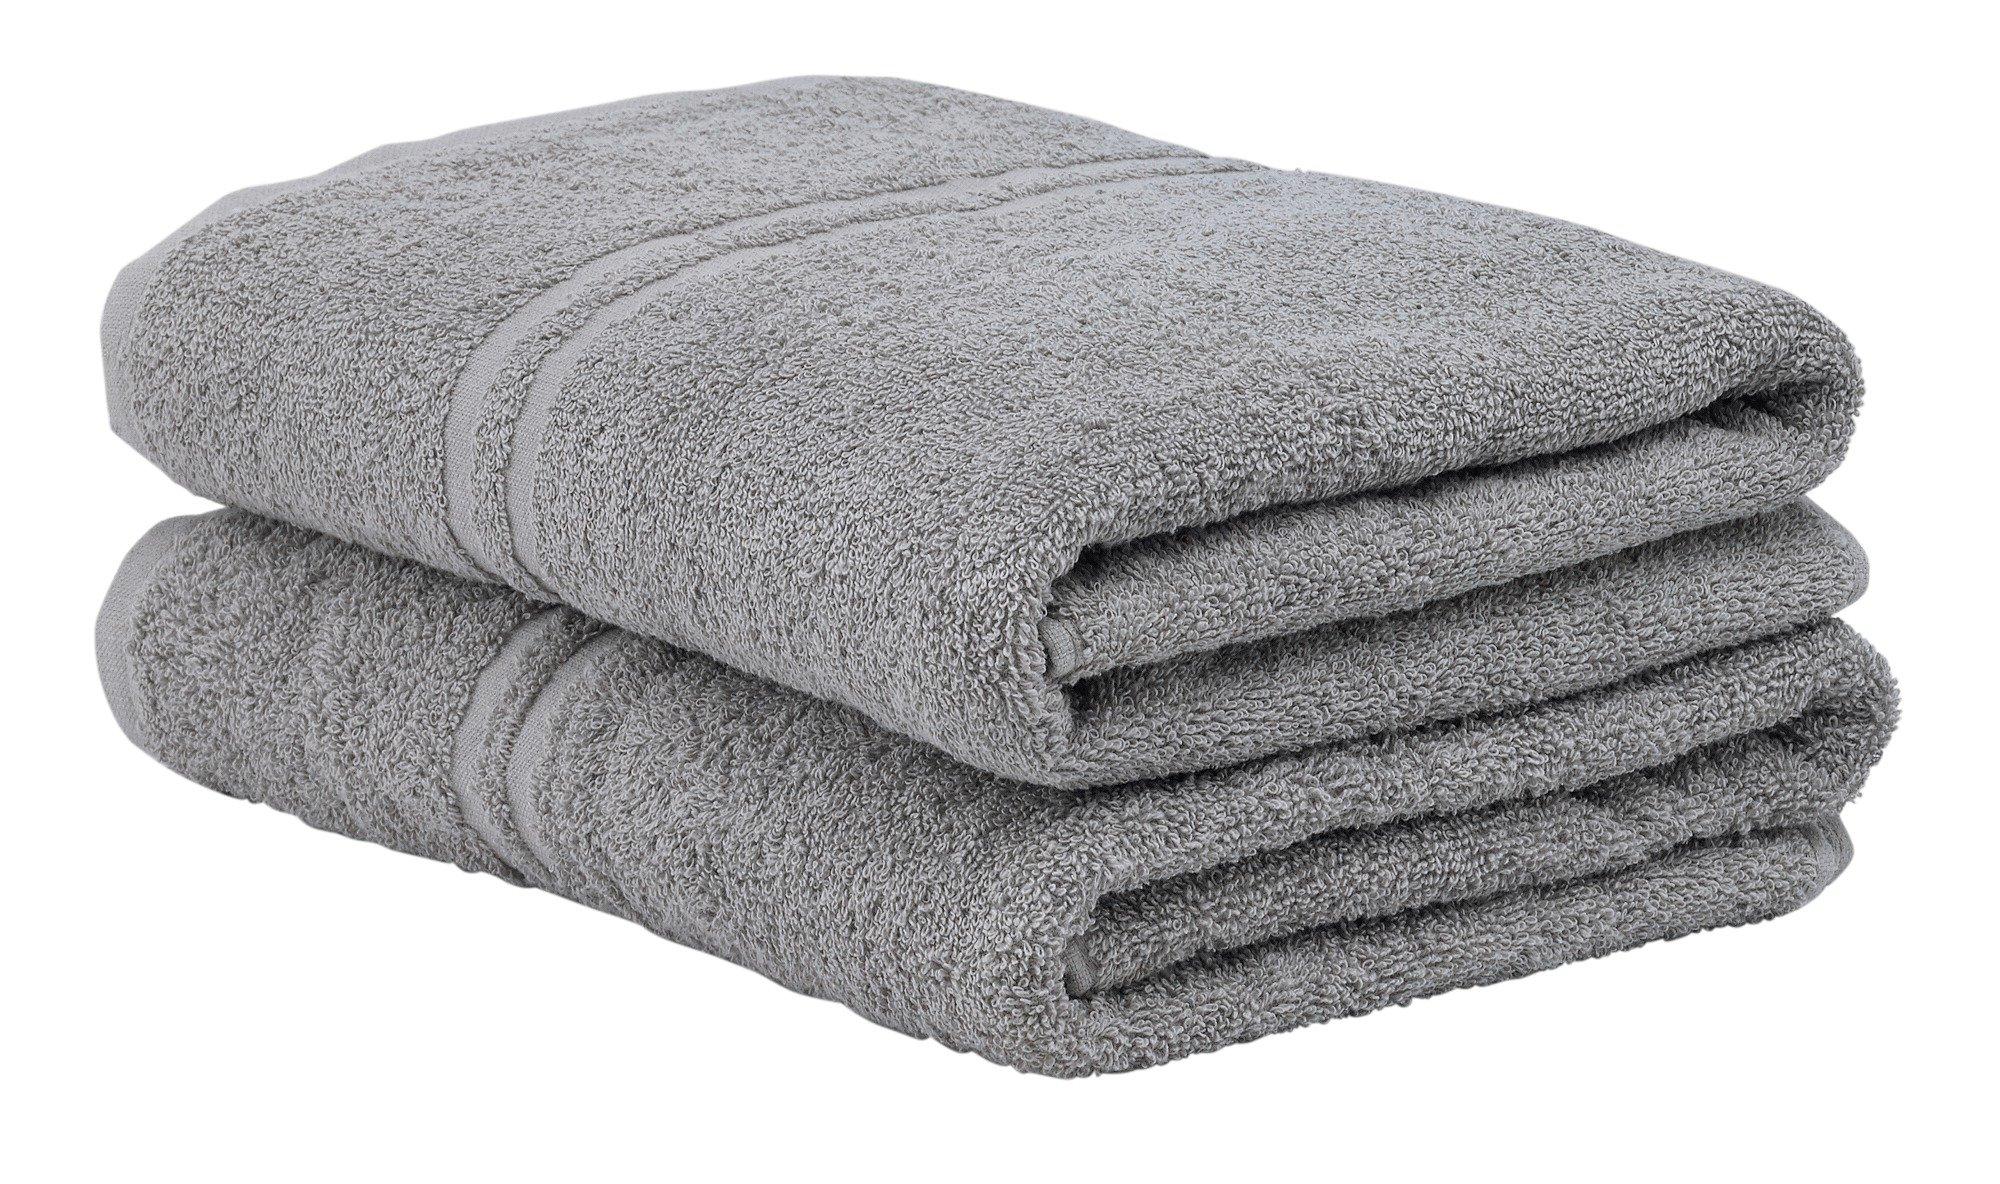 Buy Argos Home Pair Of Bath Towels Flint Grey Towels Argos